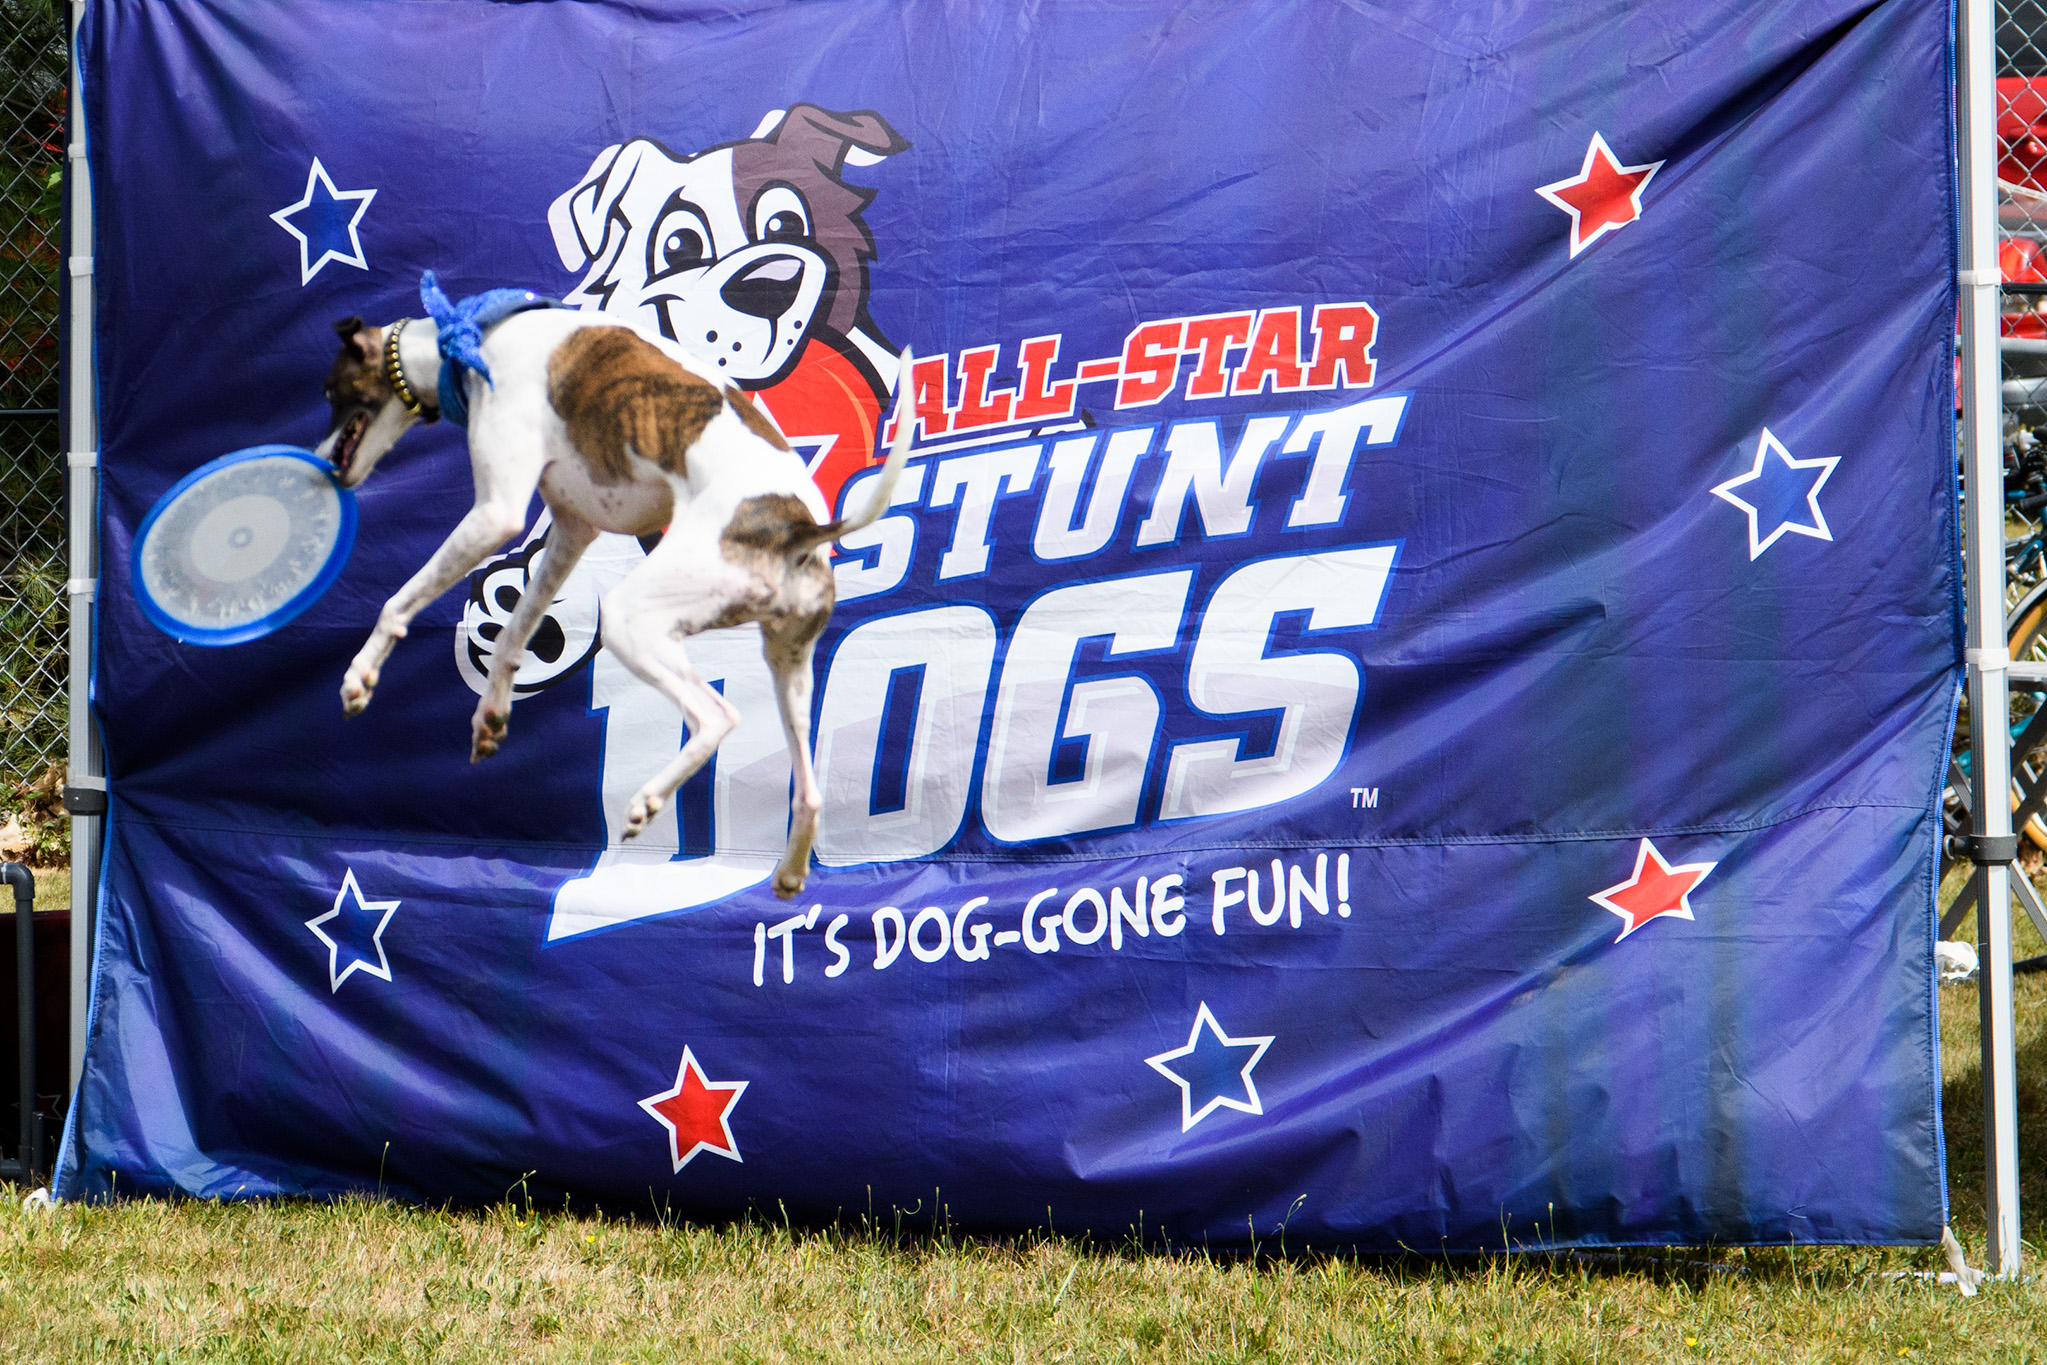 The Chris Perondi All Star Stunt Dog Challenge